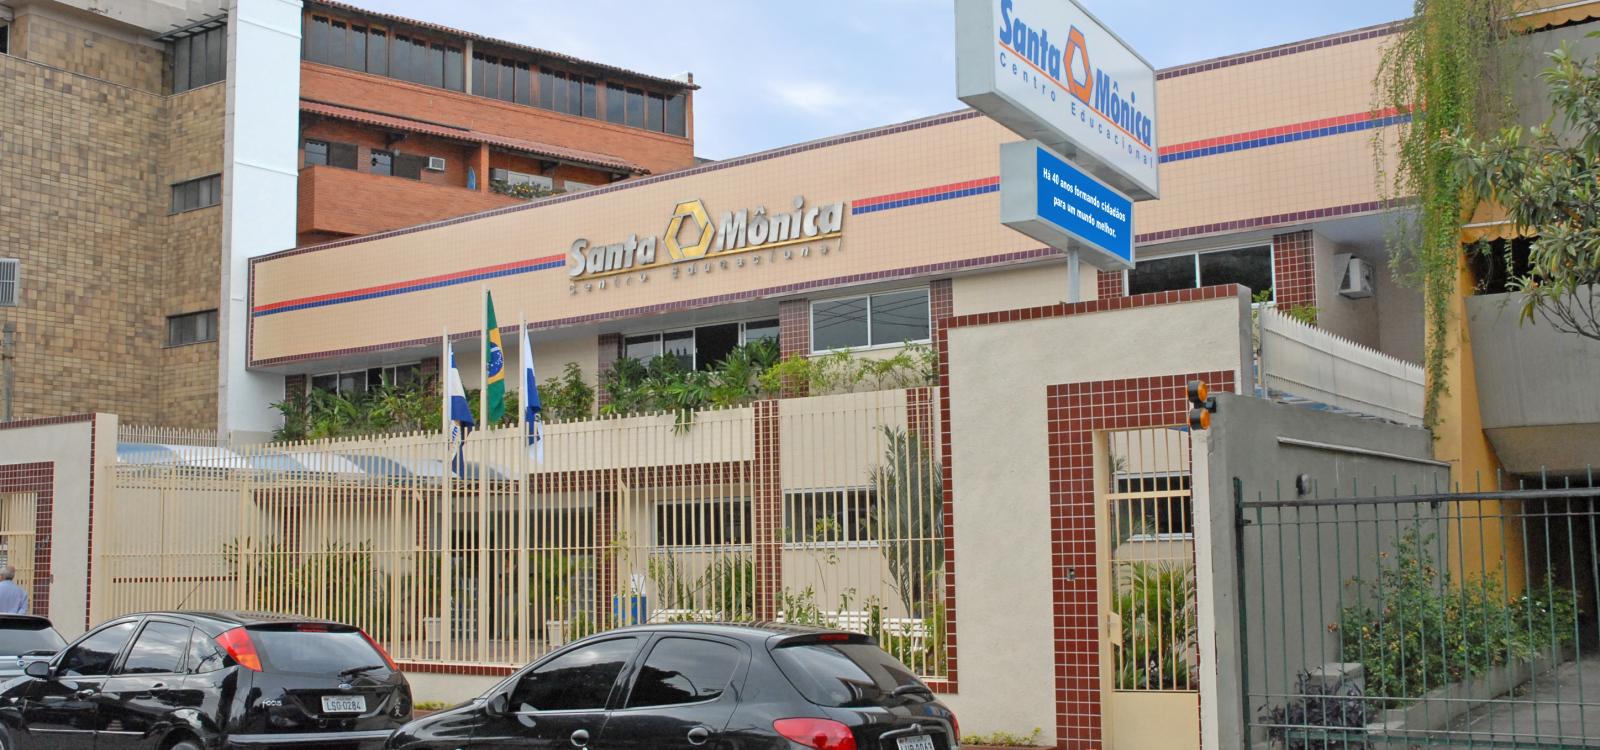 08b7a3f1b Barra da Tijuca - Santa Mônica Centro Educacional